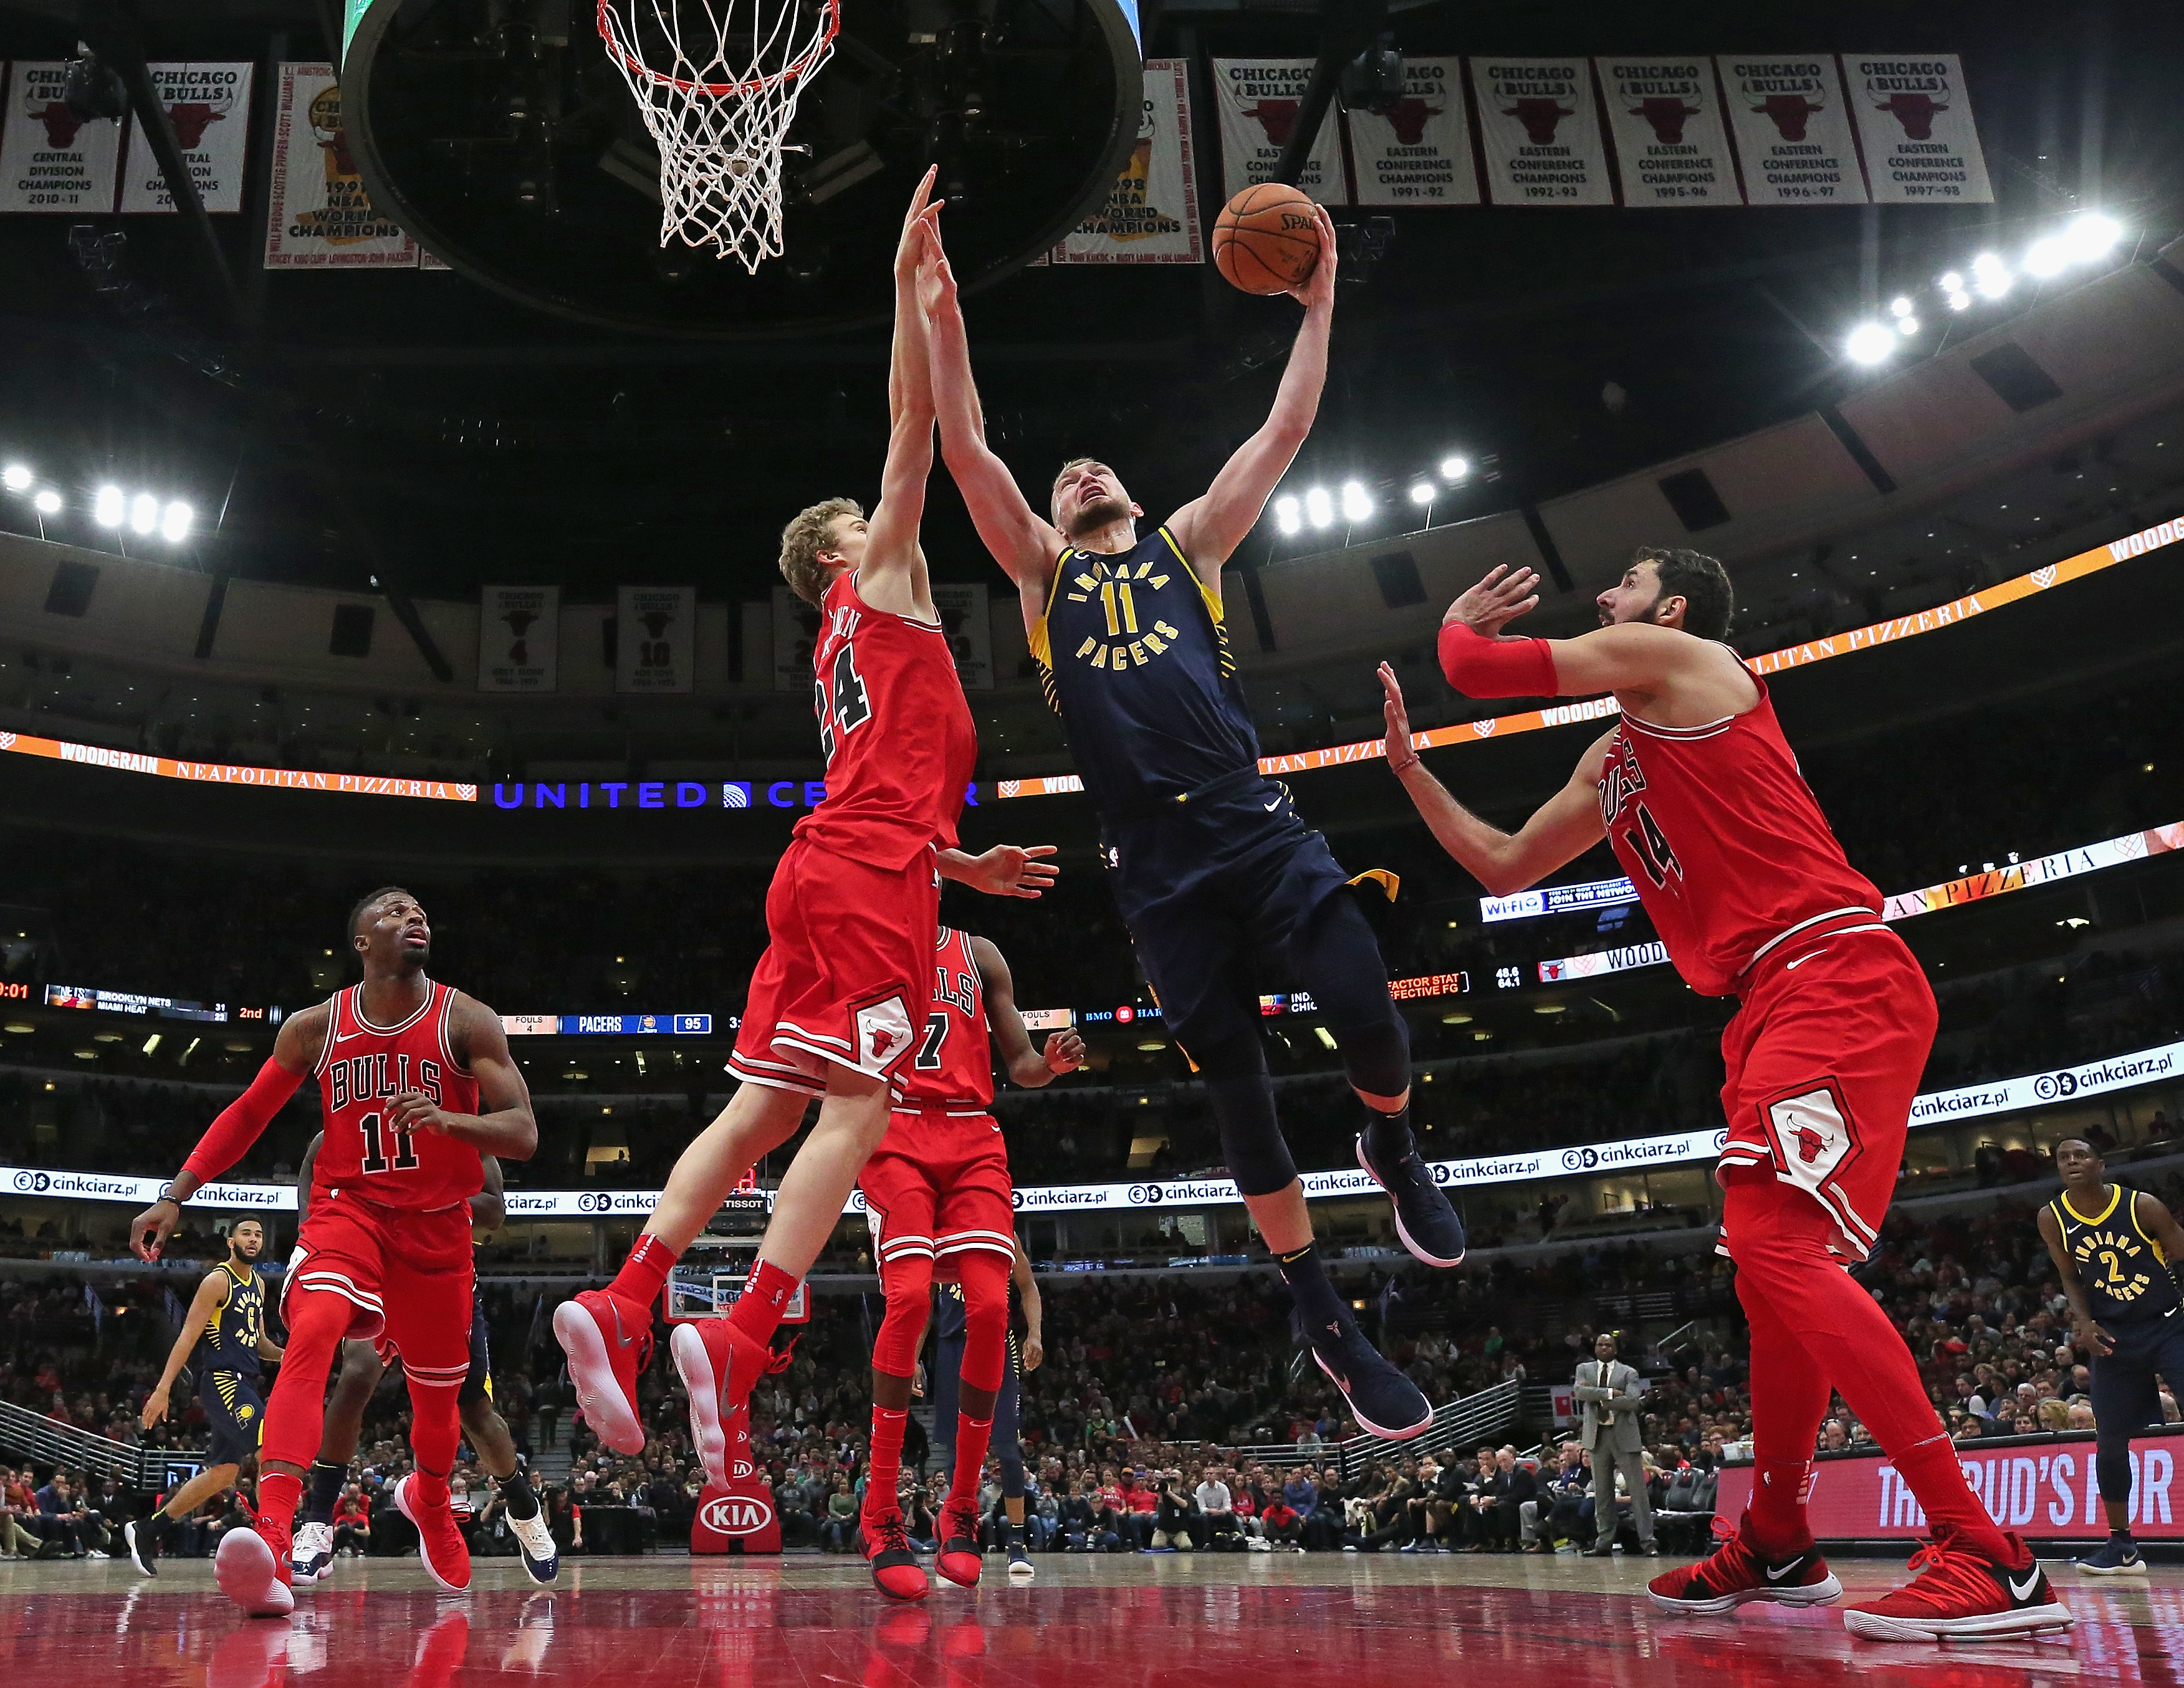 Bulls rally to down Knicks 92-87